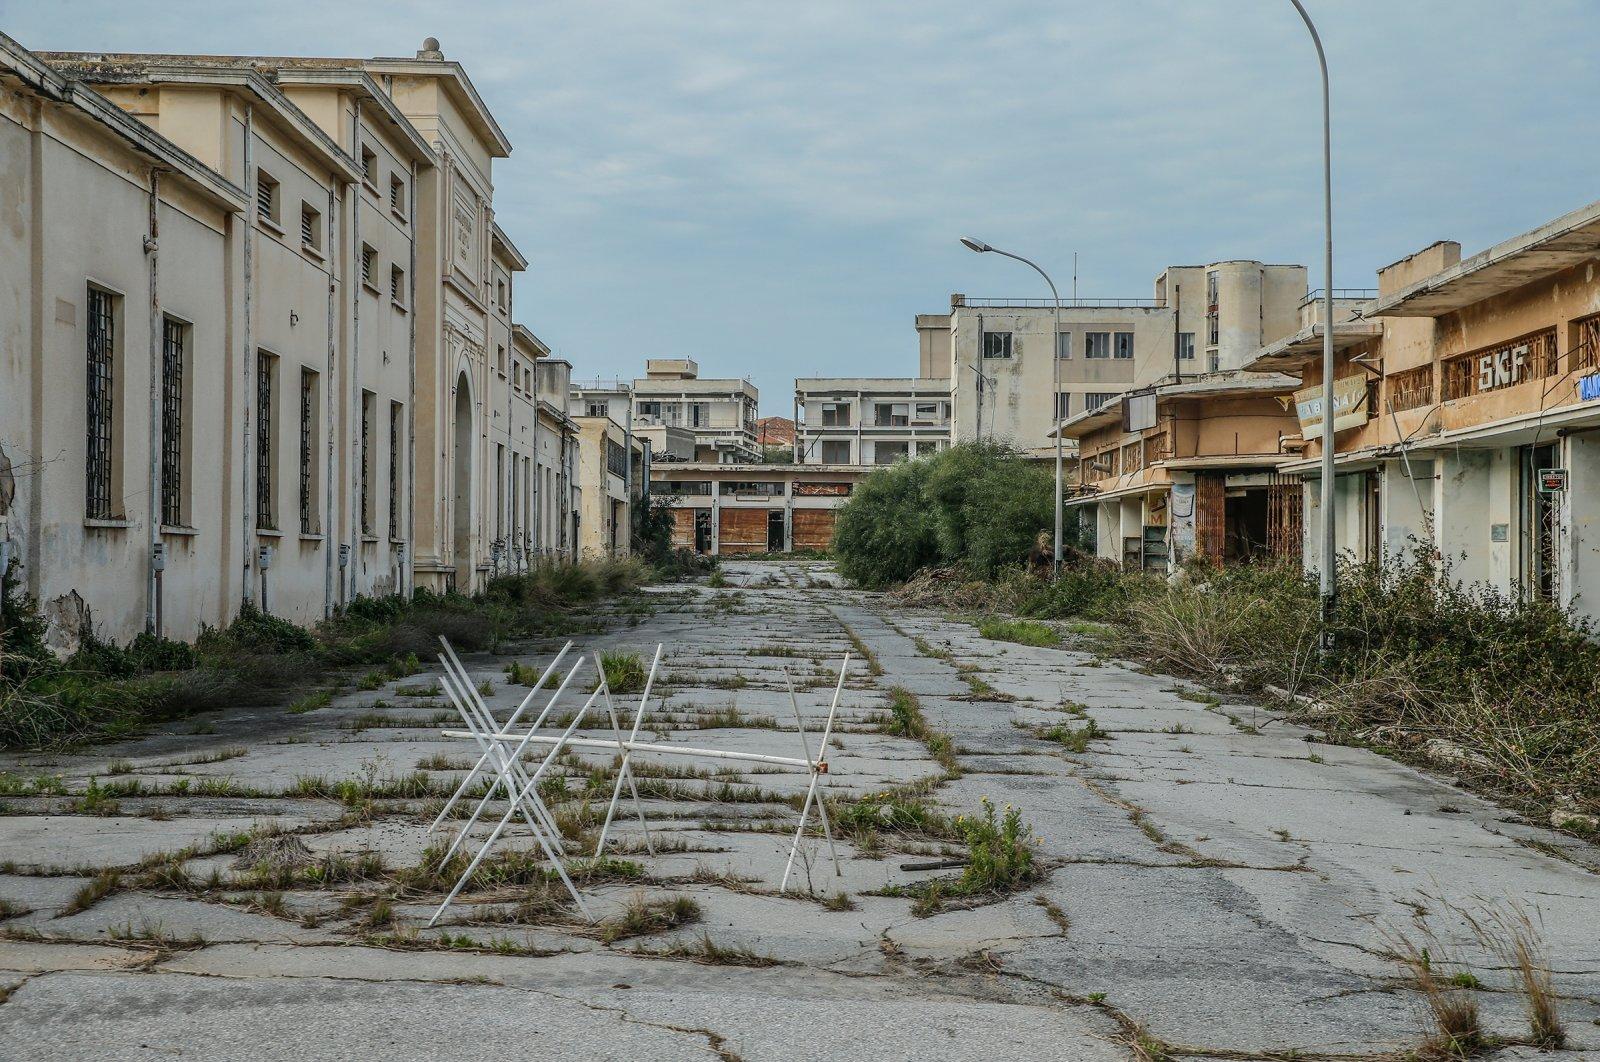 The abandoned town of Varosha (Maraş) on Oct. 8, 2020. (AA Photo)